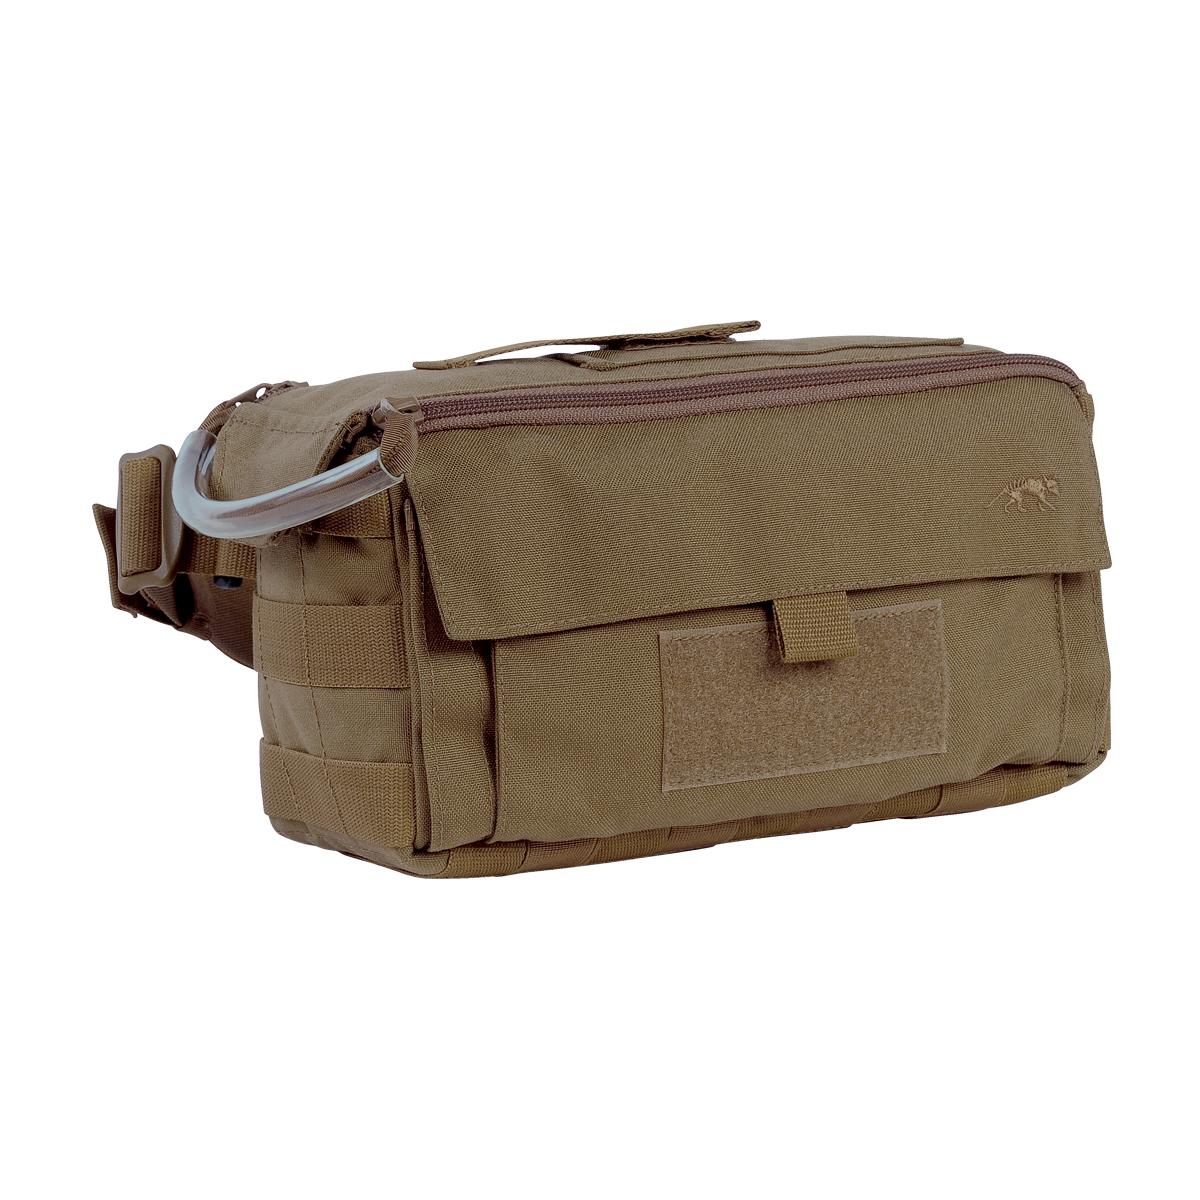 Сумка-аптечка TT SMALL MEDIC PACK coyote brown, 7787.346